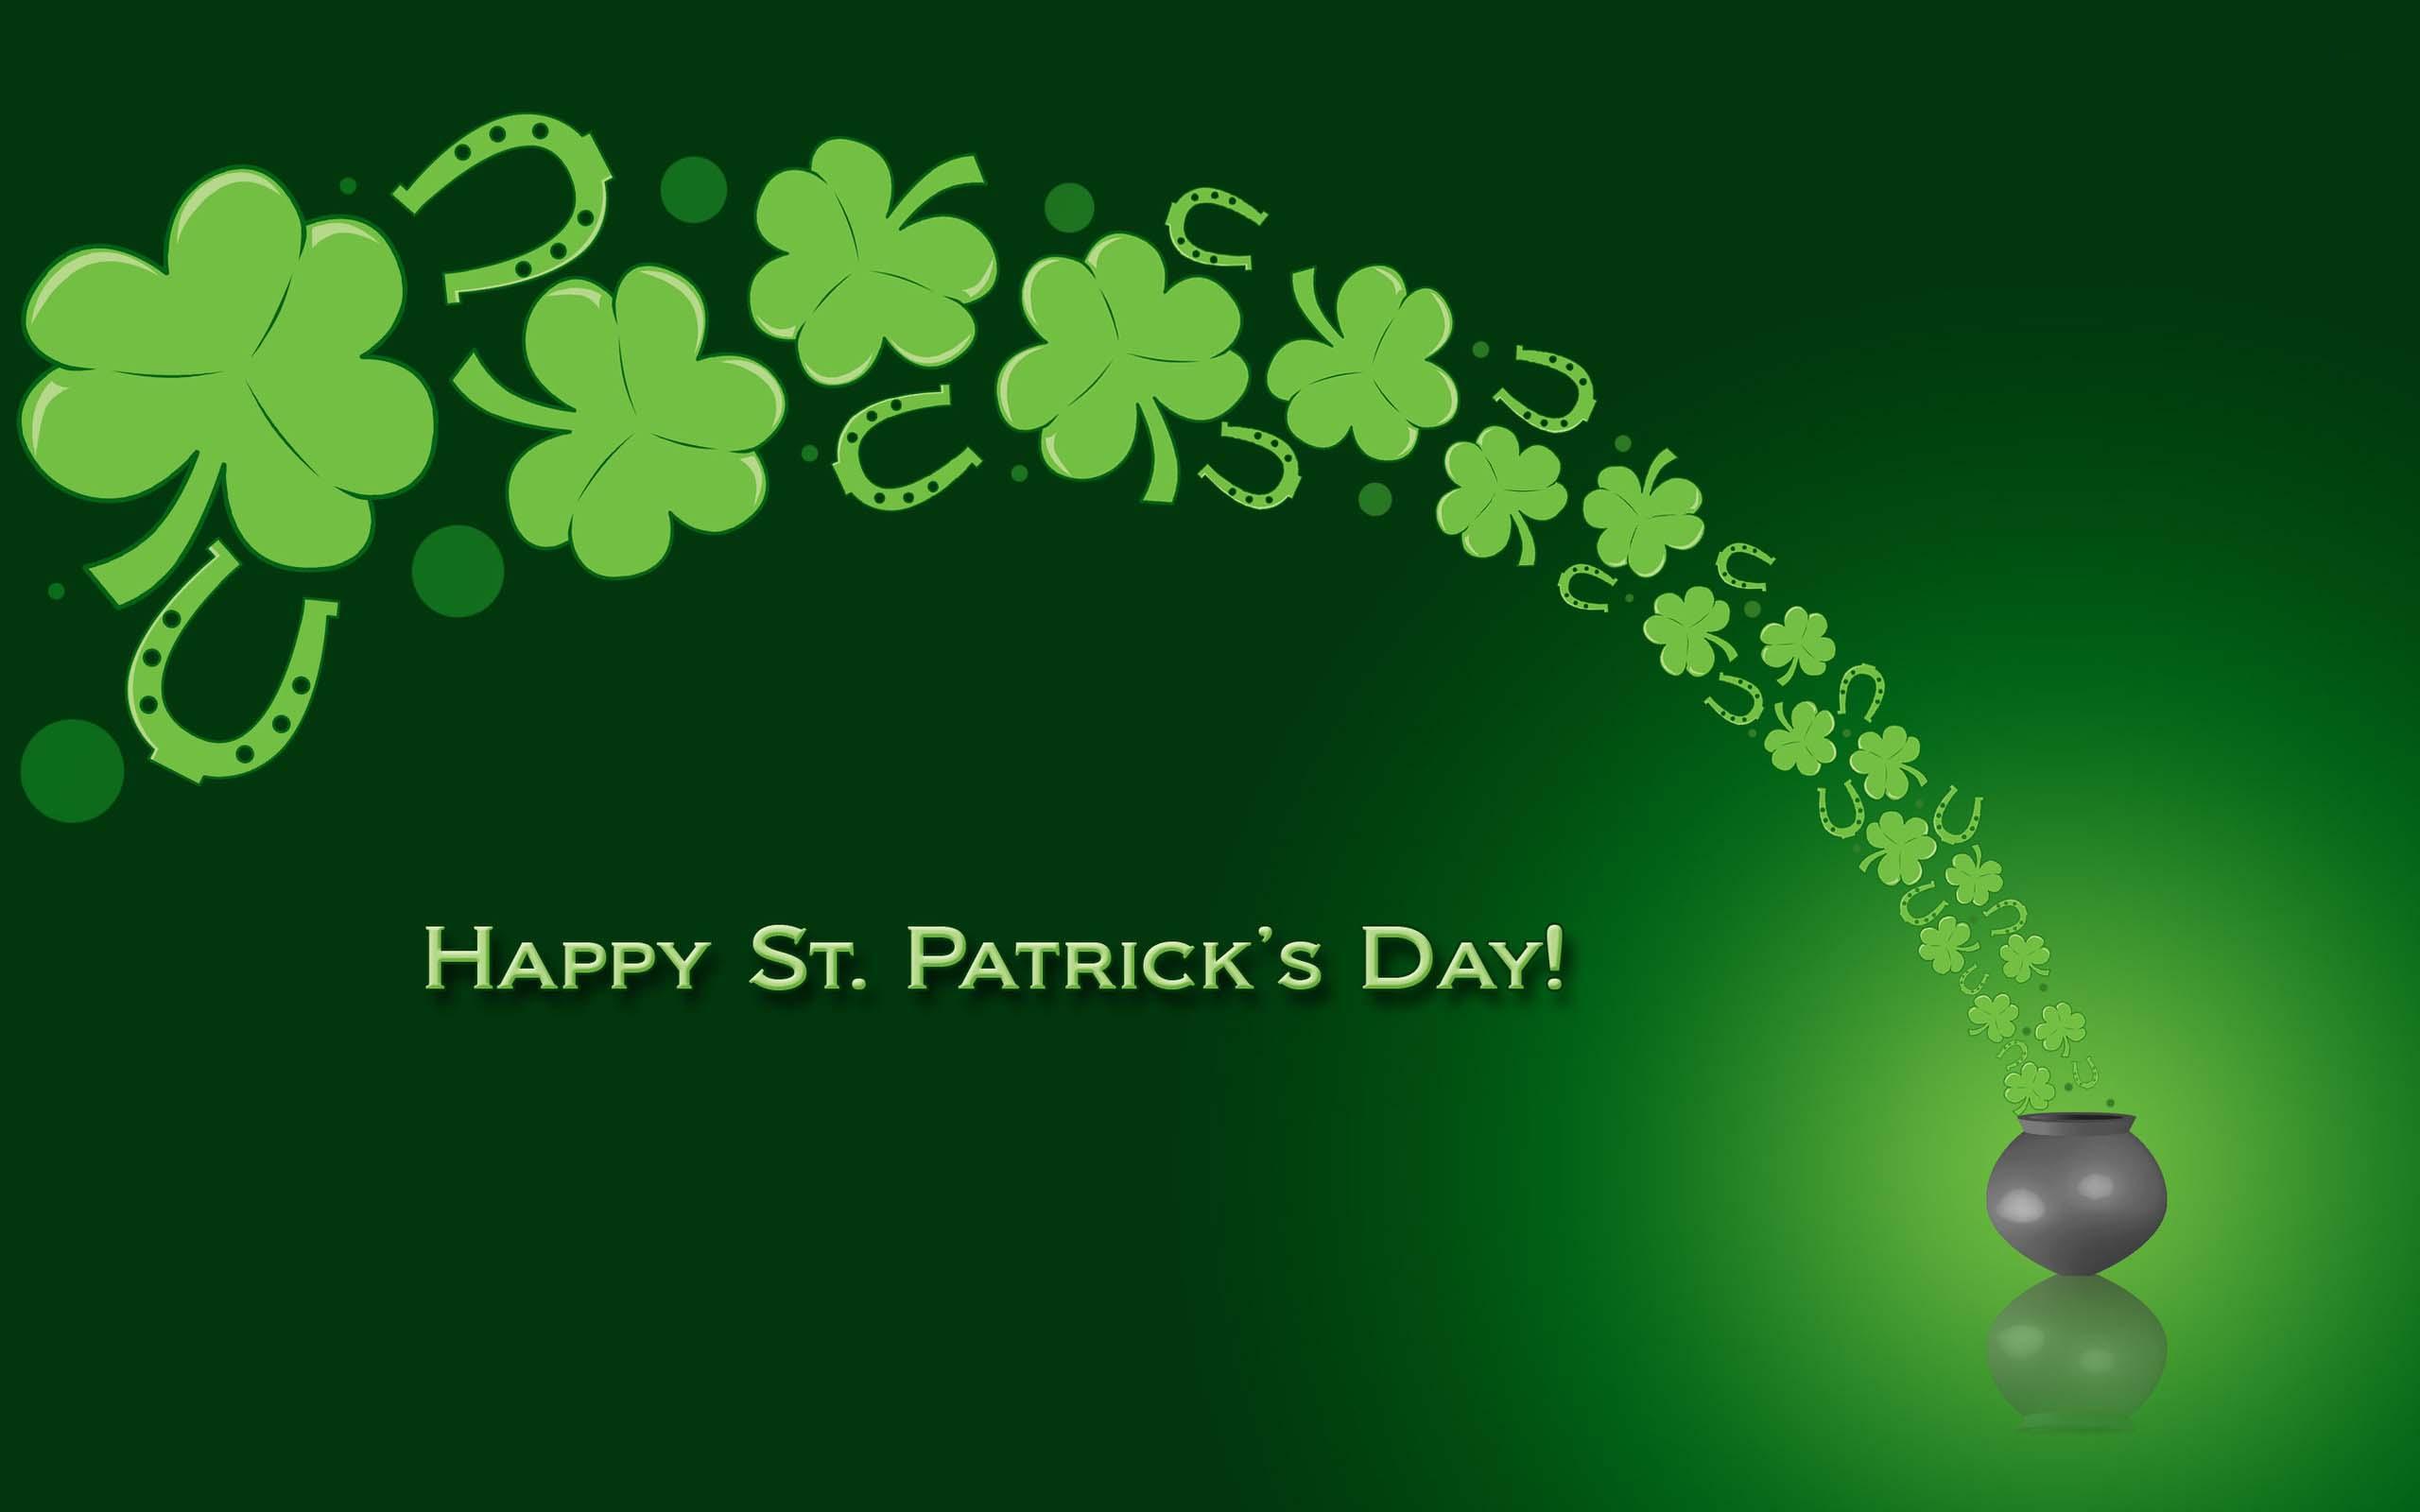 Download St Patricks Day Wallpaper 44   Wallpaper For 2560x1600